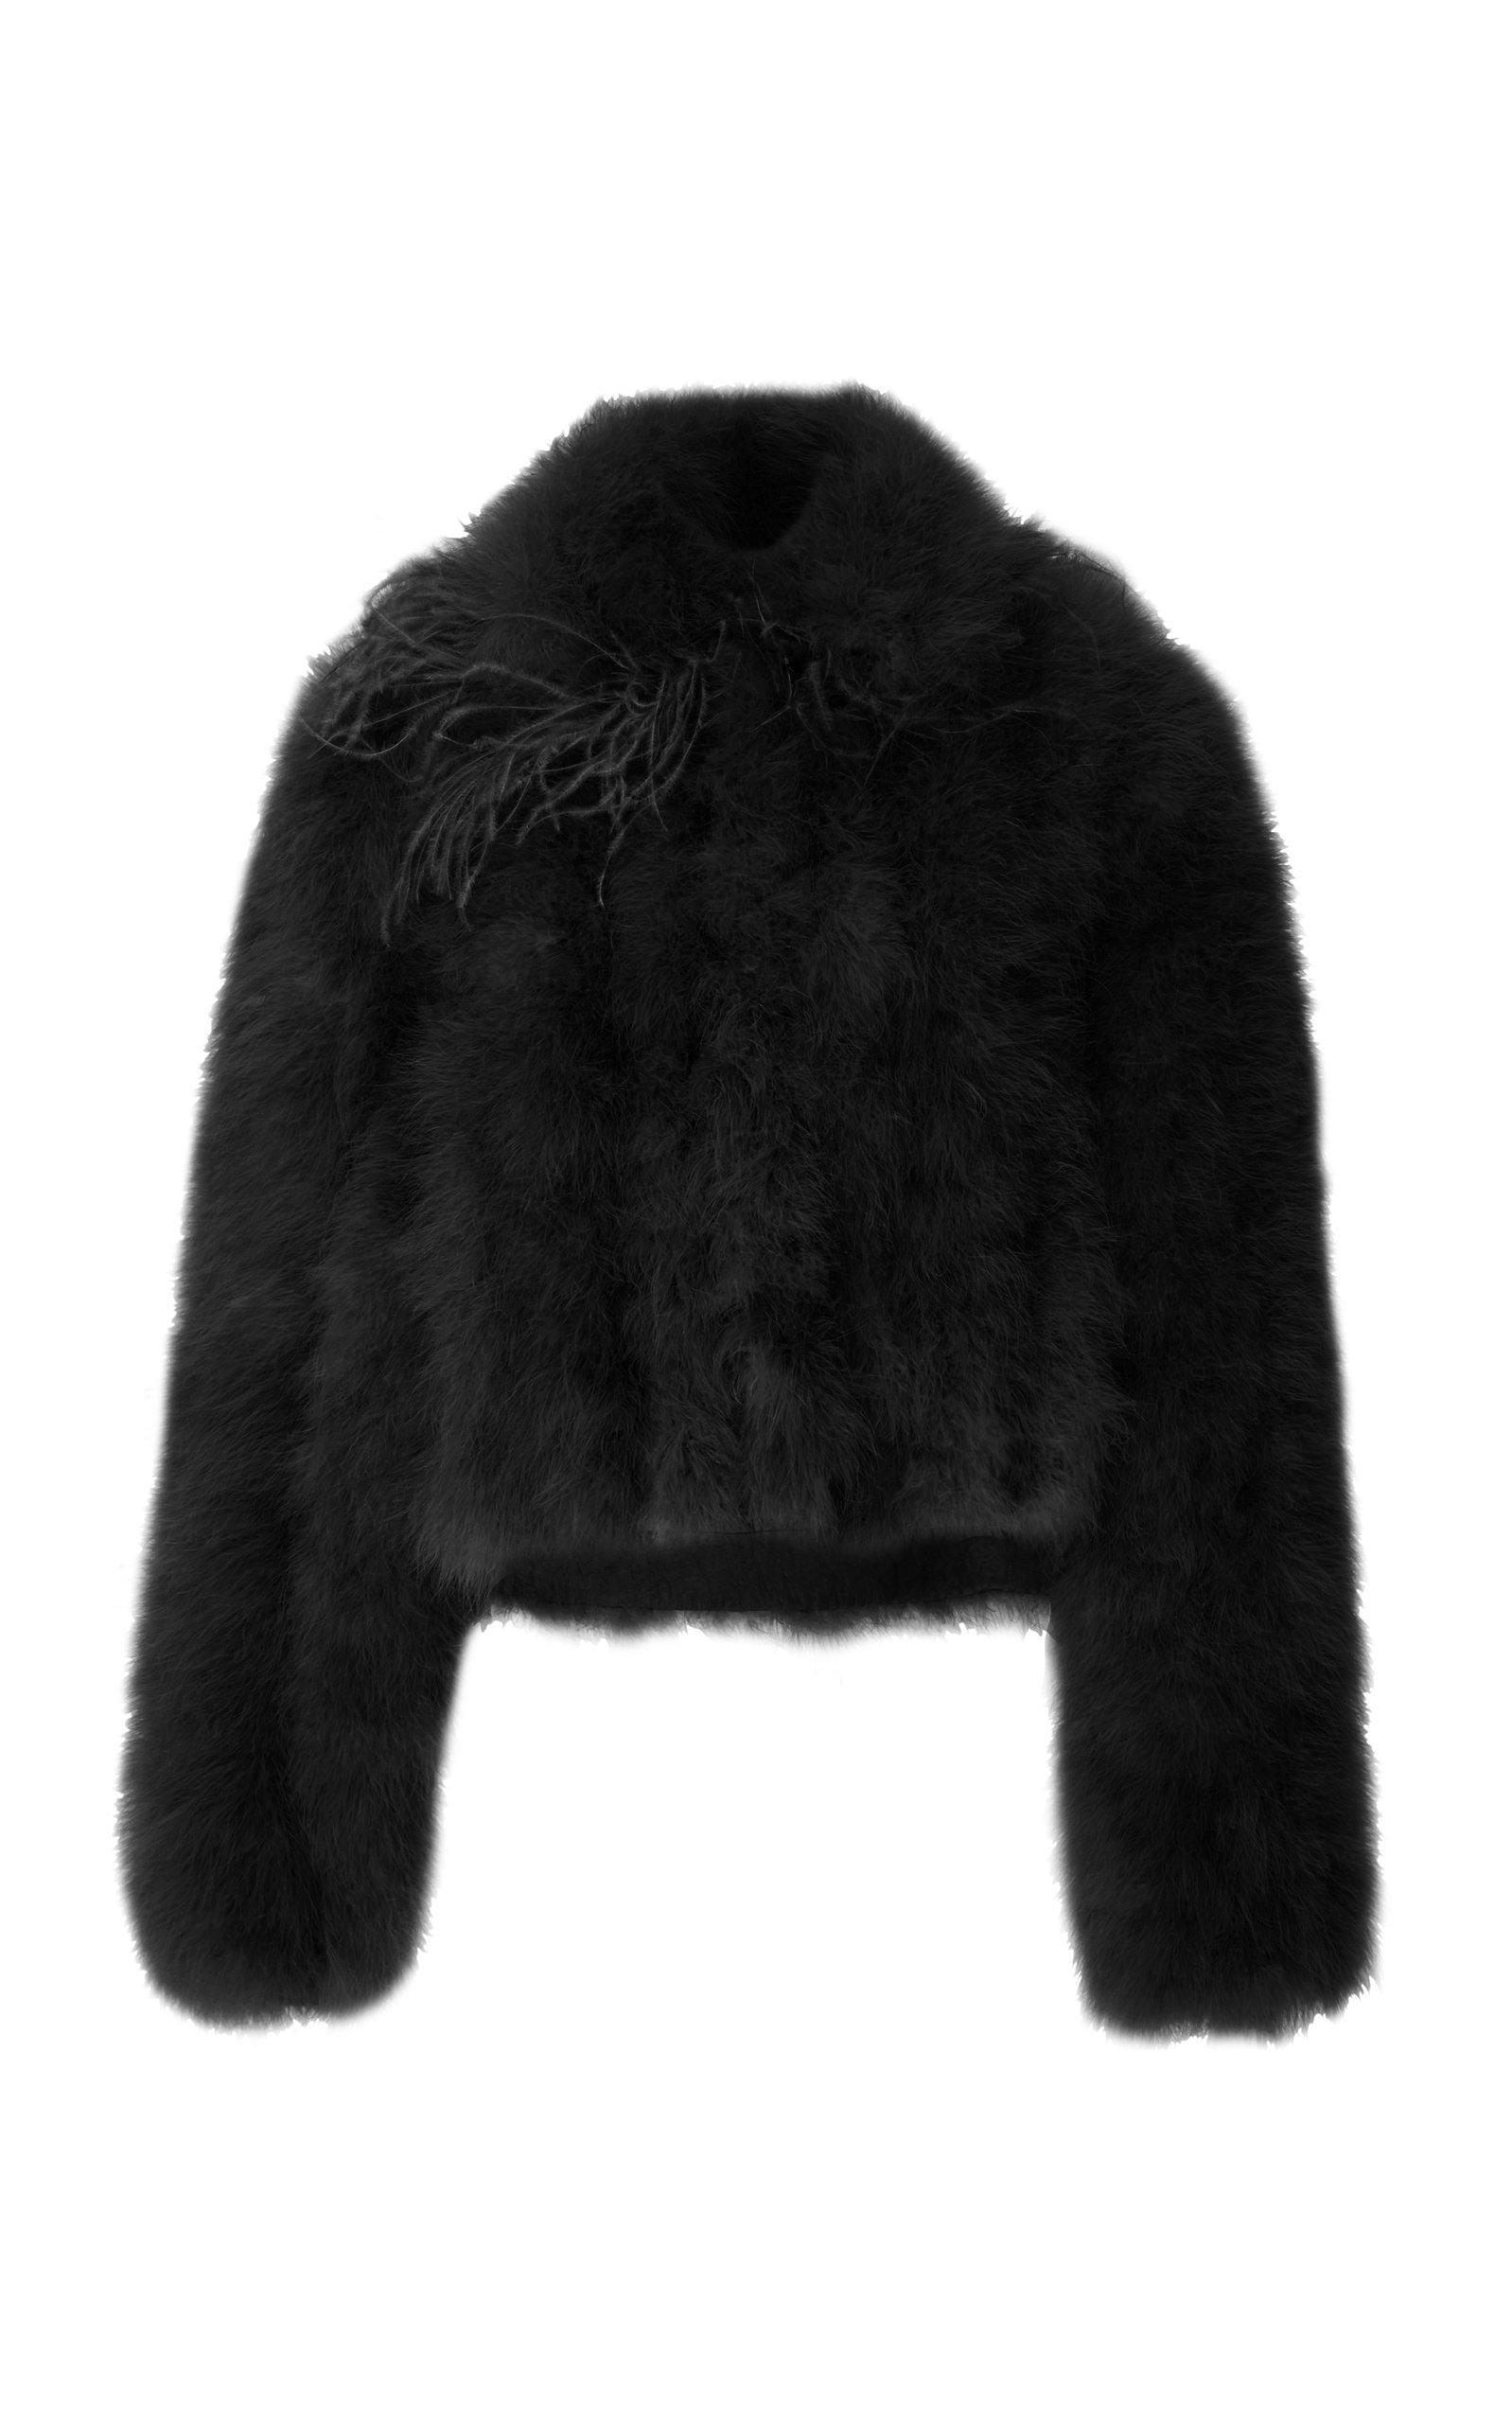 Adeam Marabou Jacket In Black